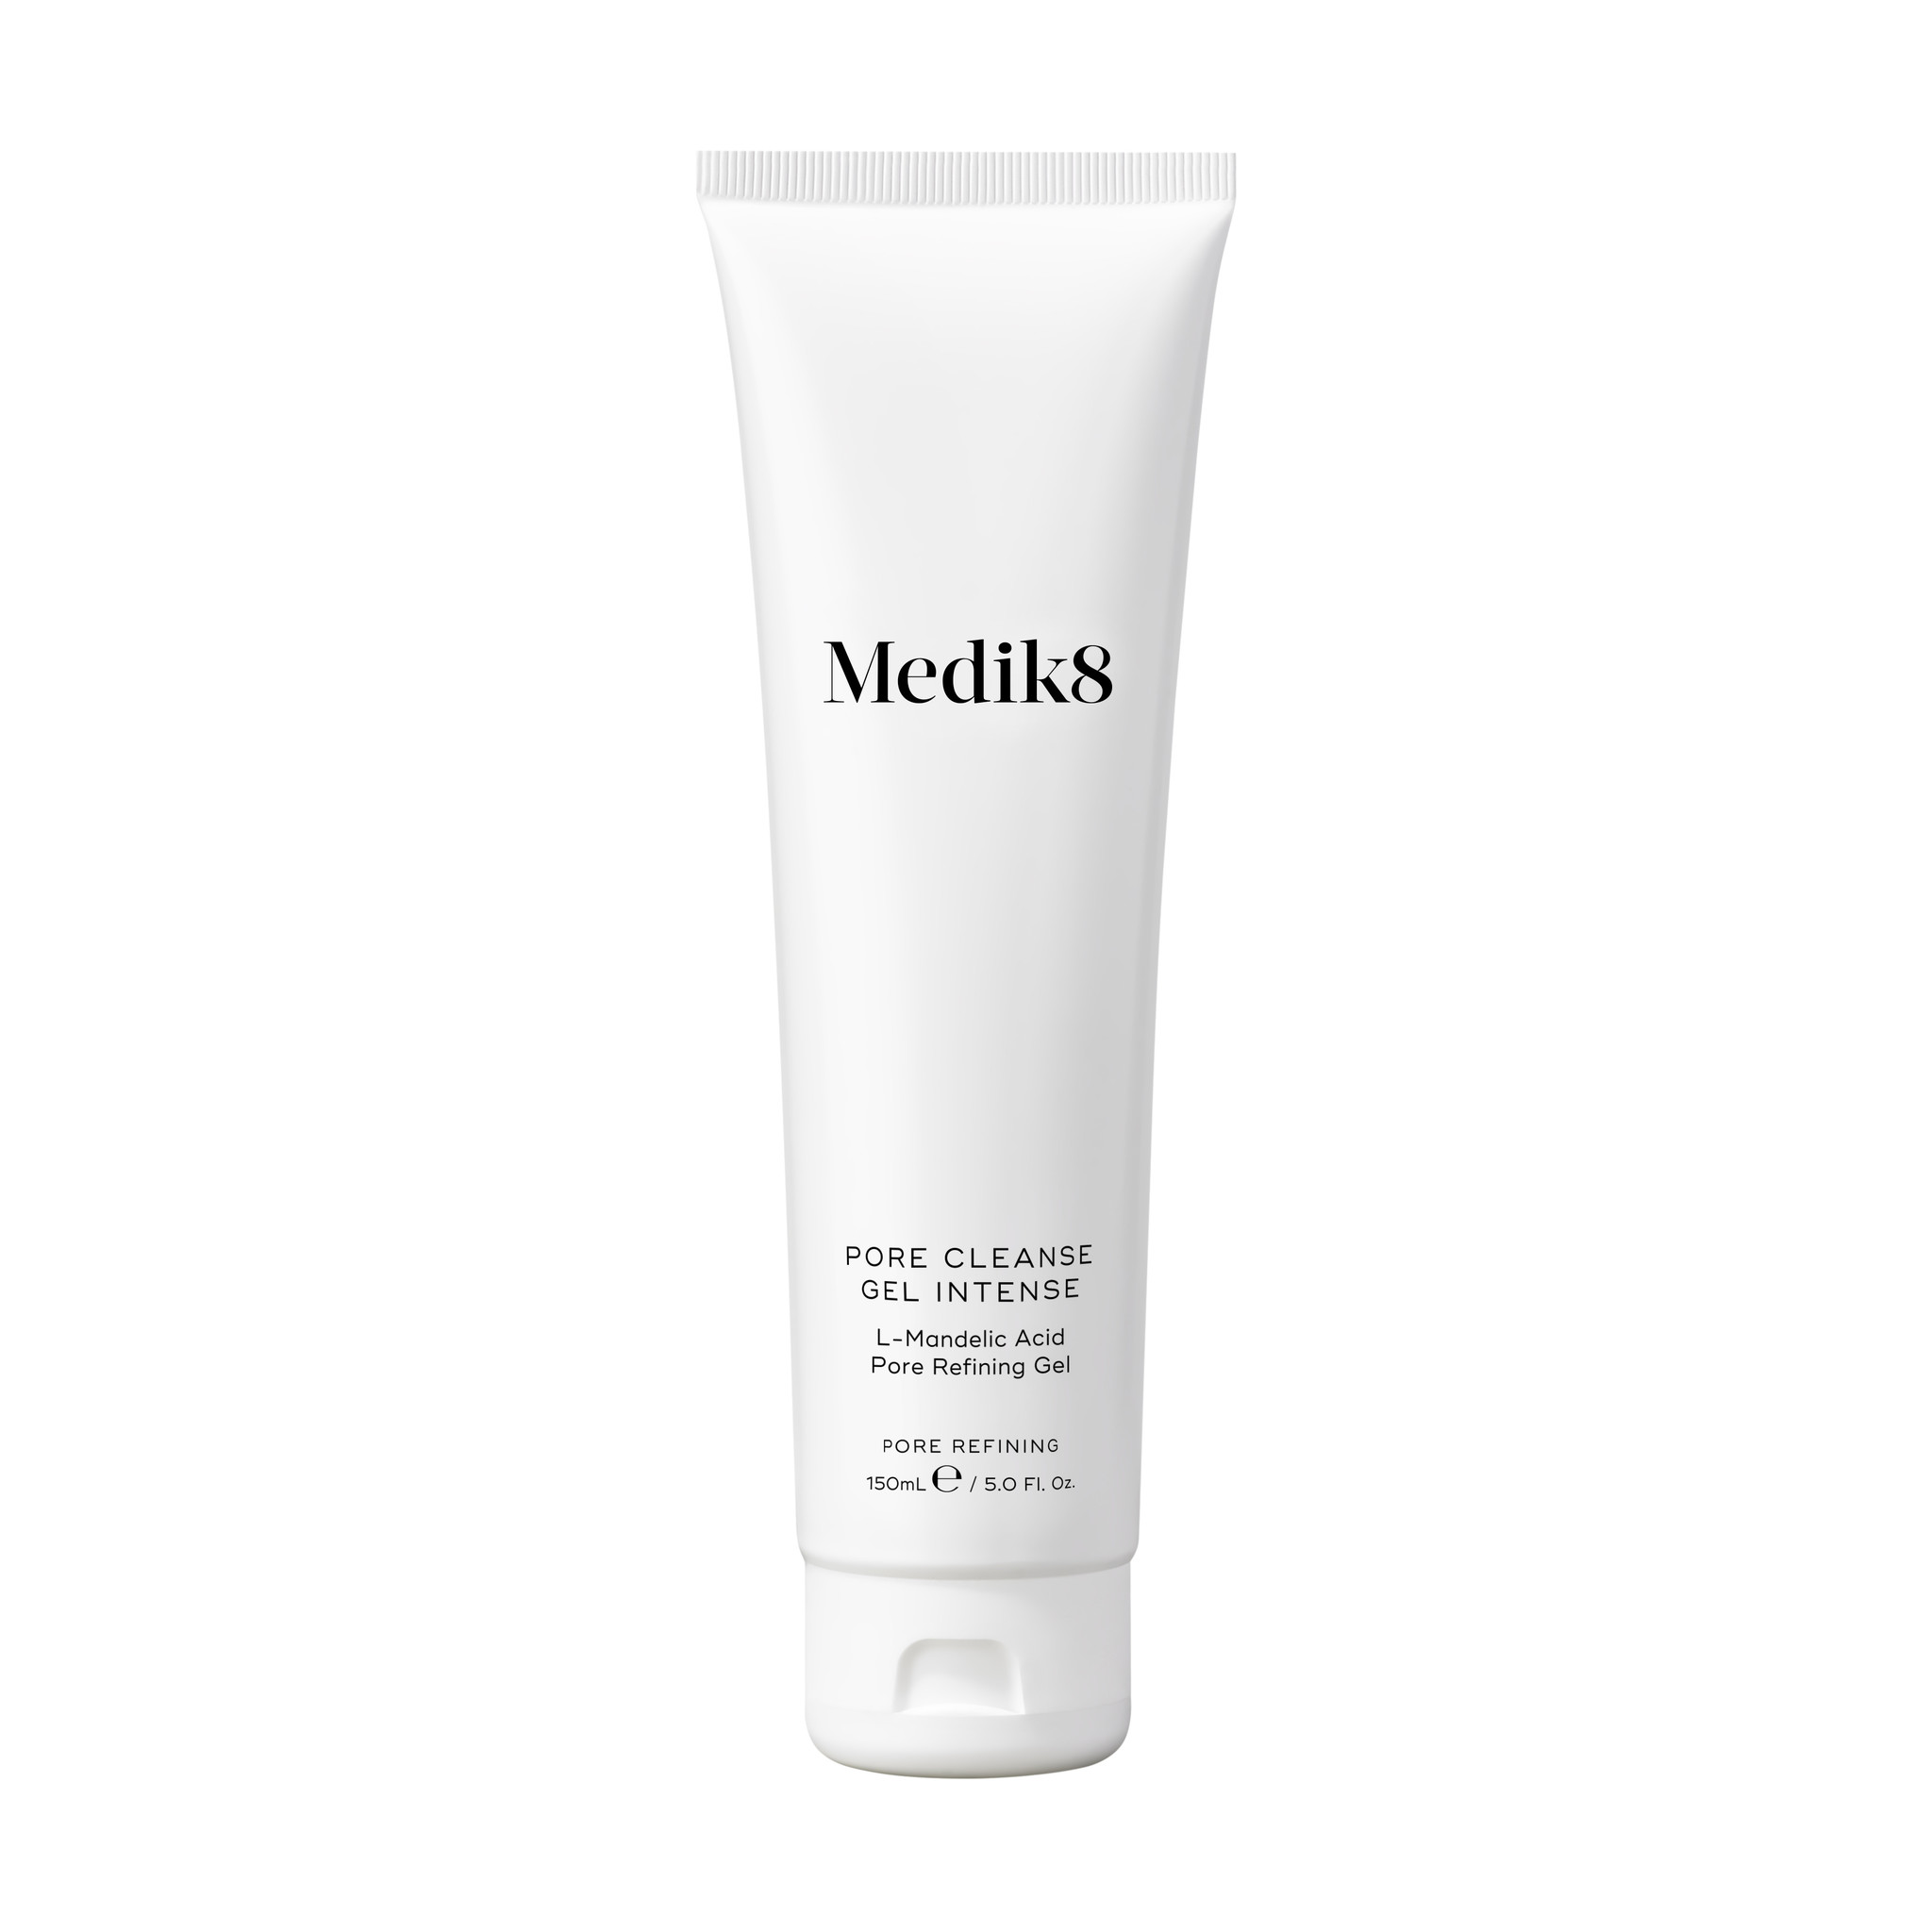 Medik8 Pore Cleanse Gel Intense | L-Mandelic Acid Pore Refining Gel | 150ml